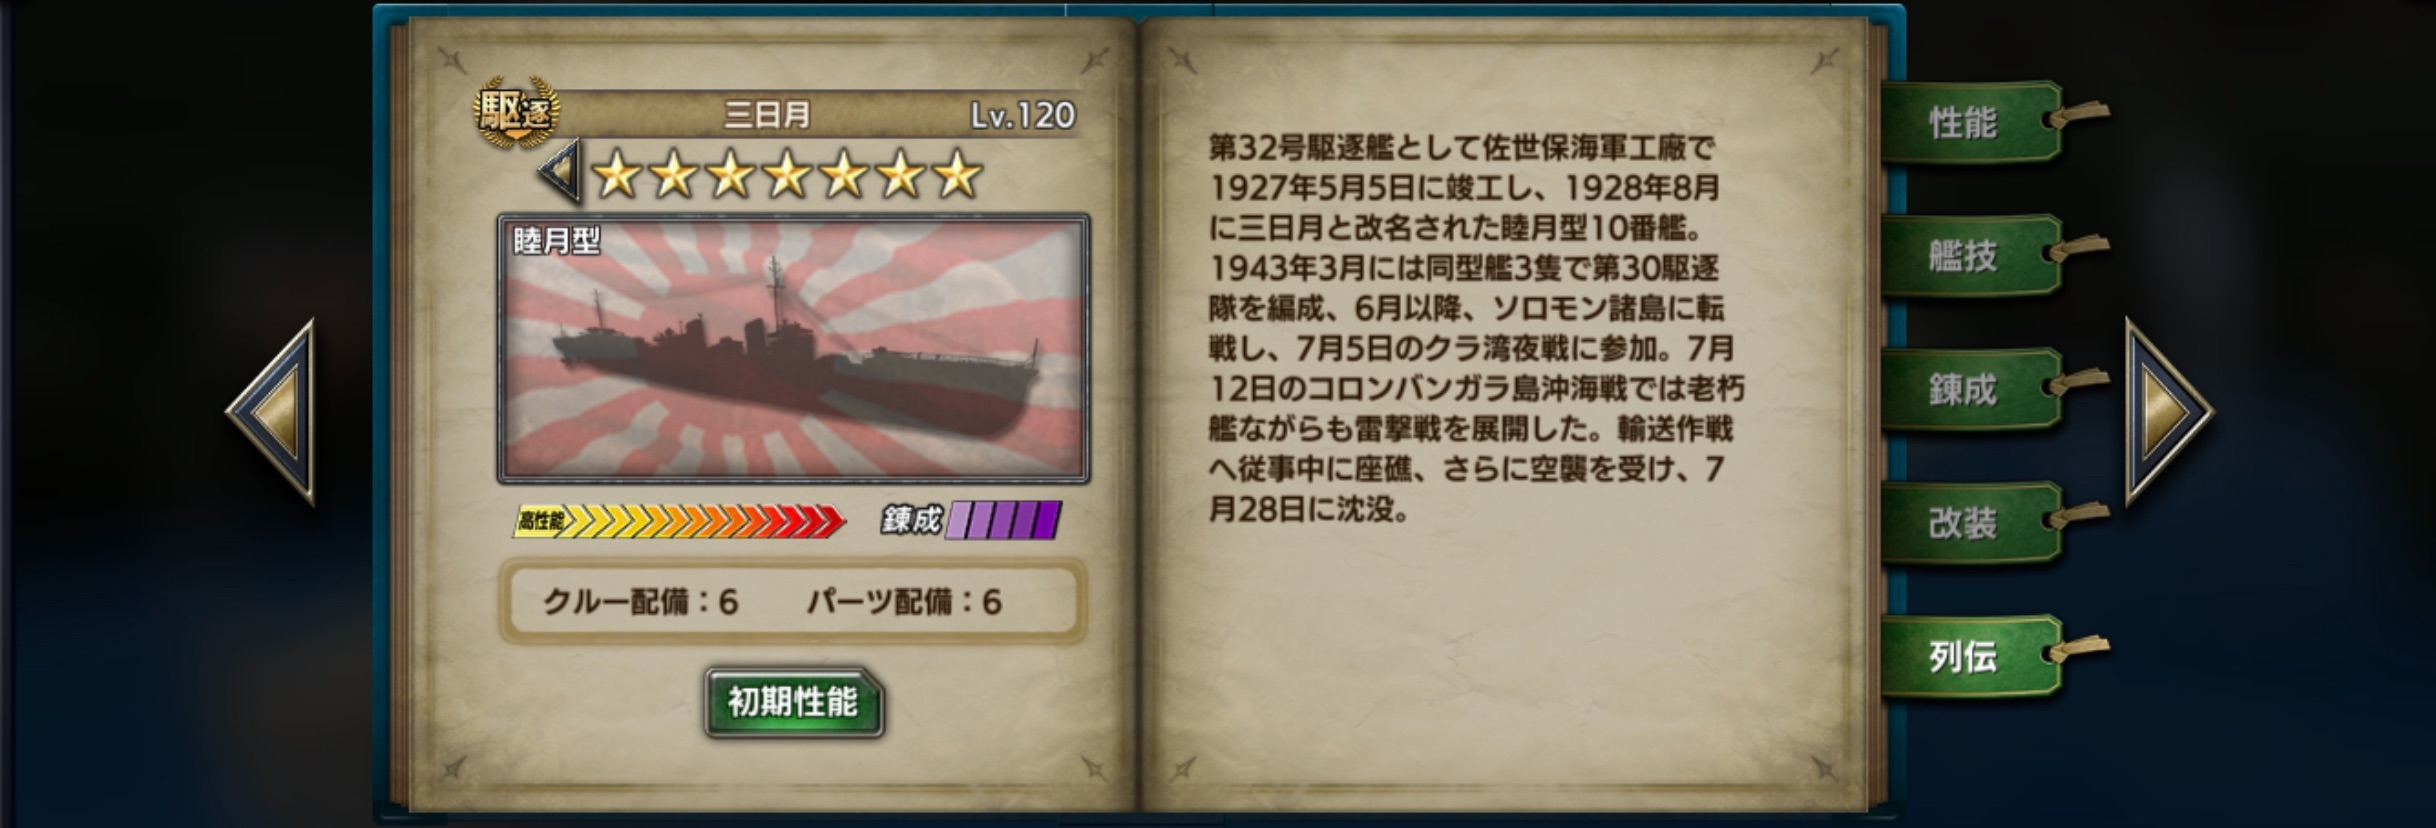 Mikadzuki-history